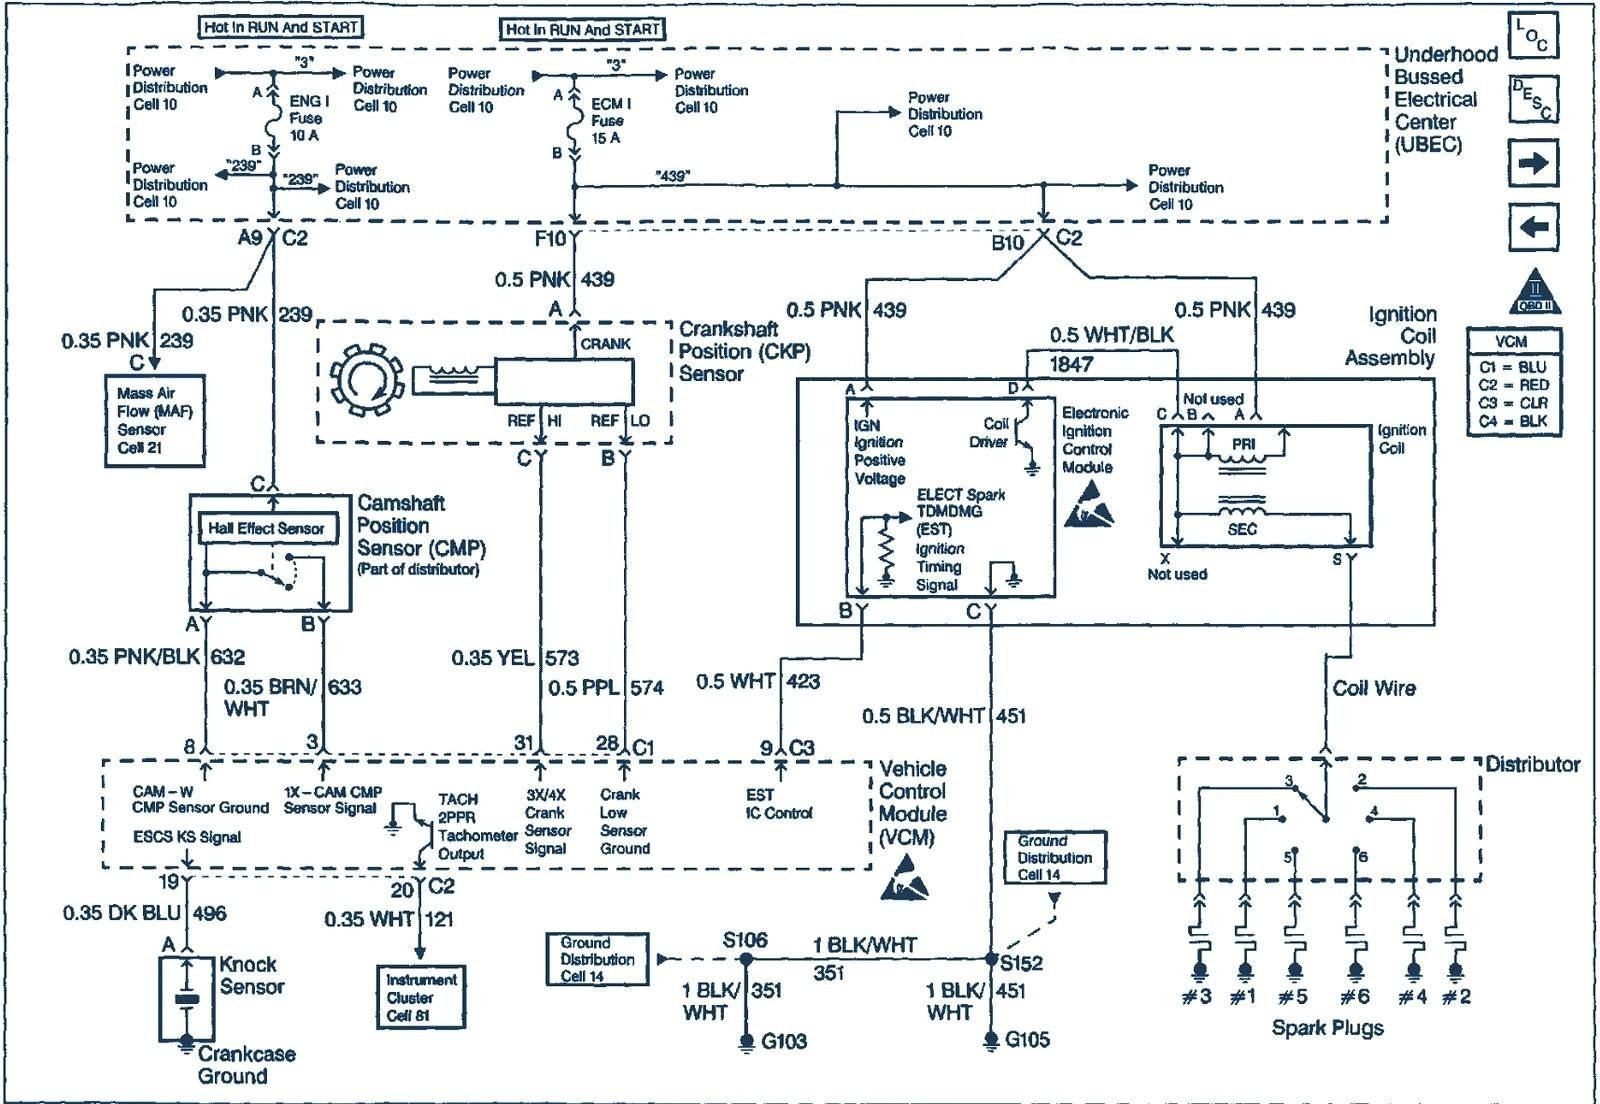 ND_9631] Isuzu Bus Wiring Diagram Download DiagramKumb Hendil Mohammedshrine Librar Wiring 101